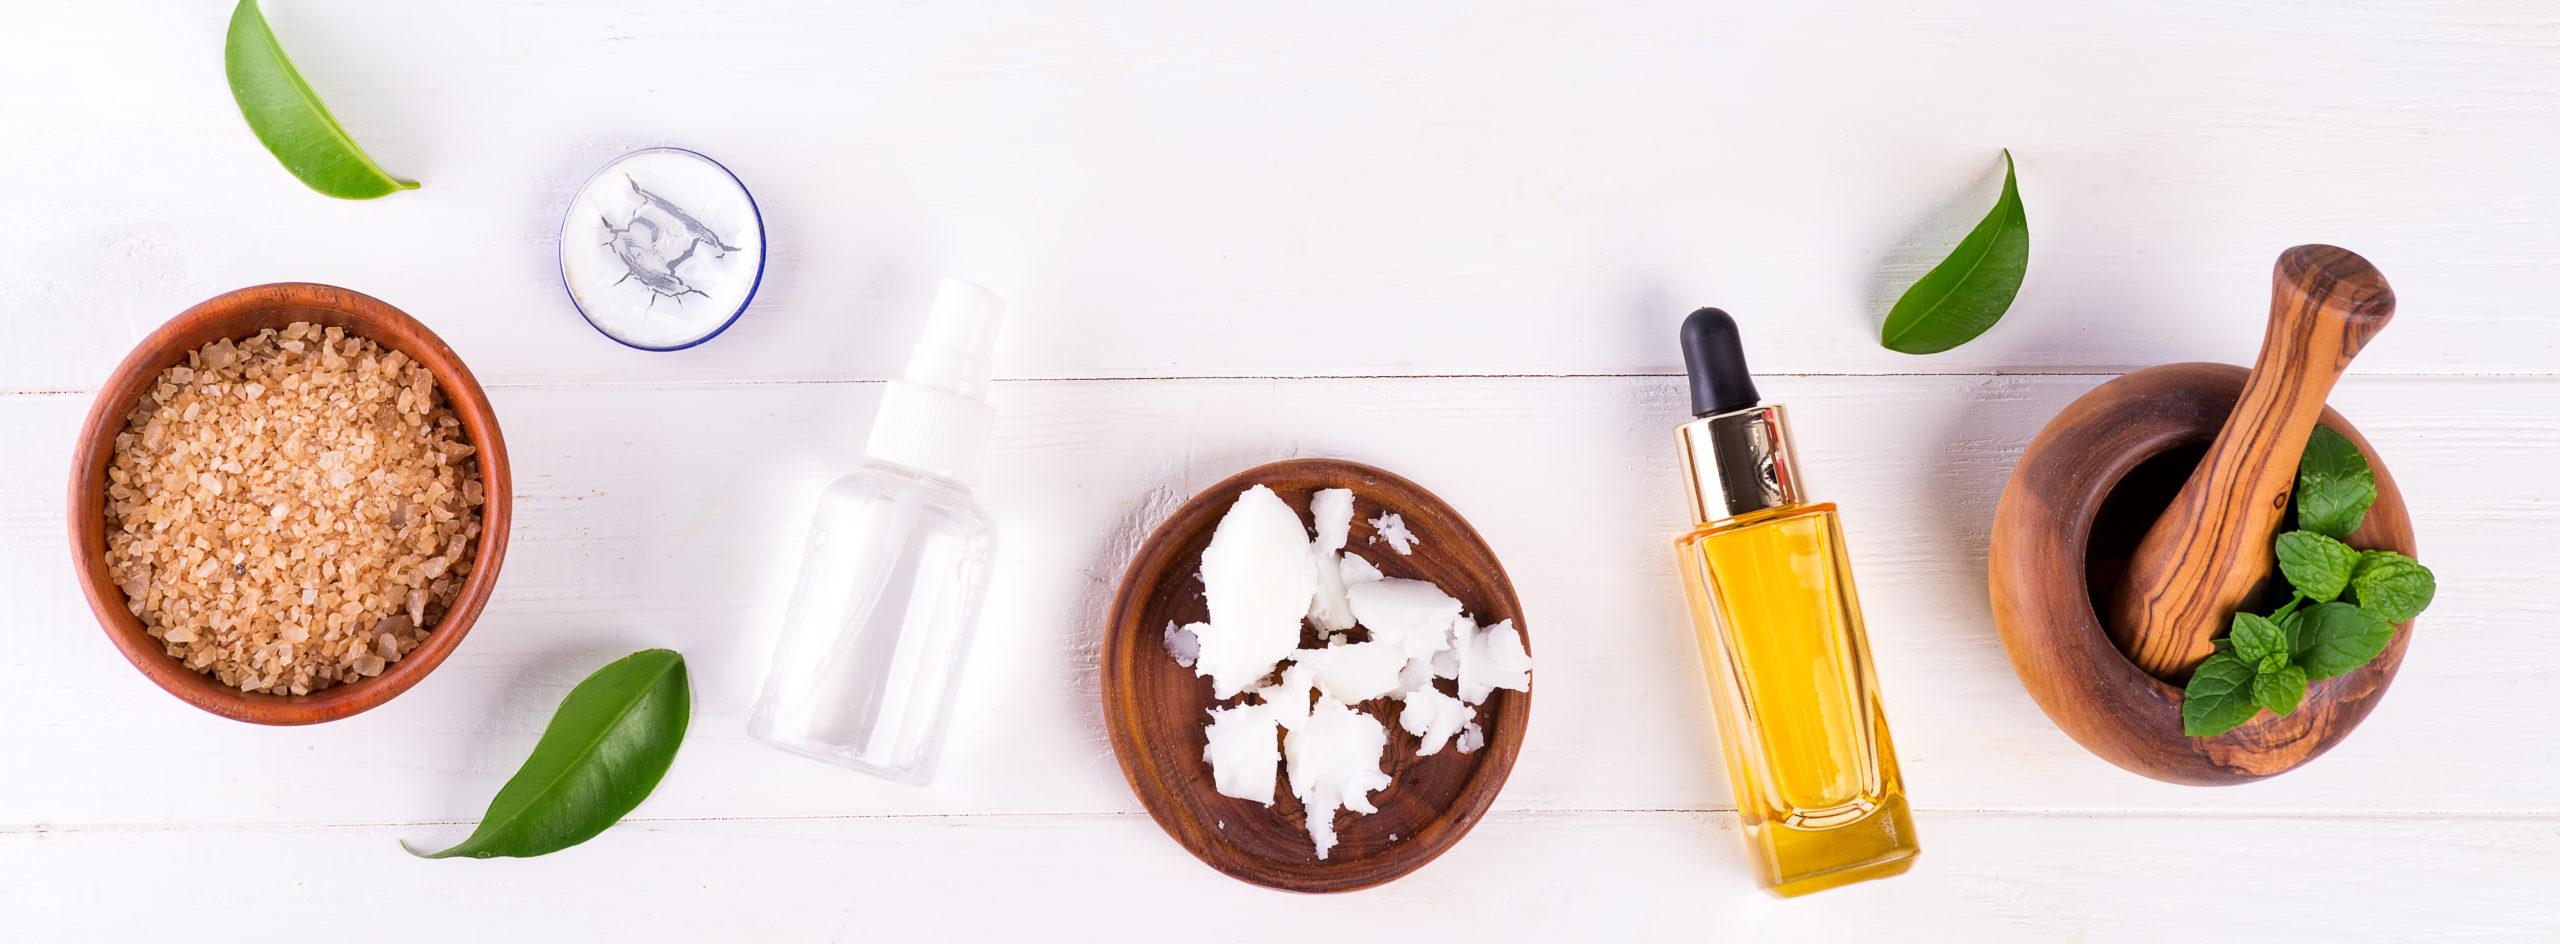 #iorestoacasa: beauty routine homemade